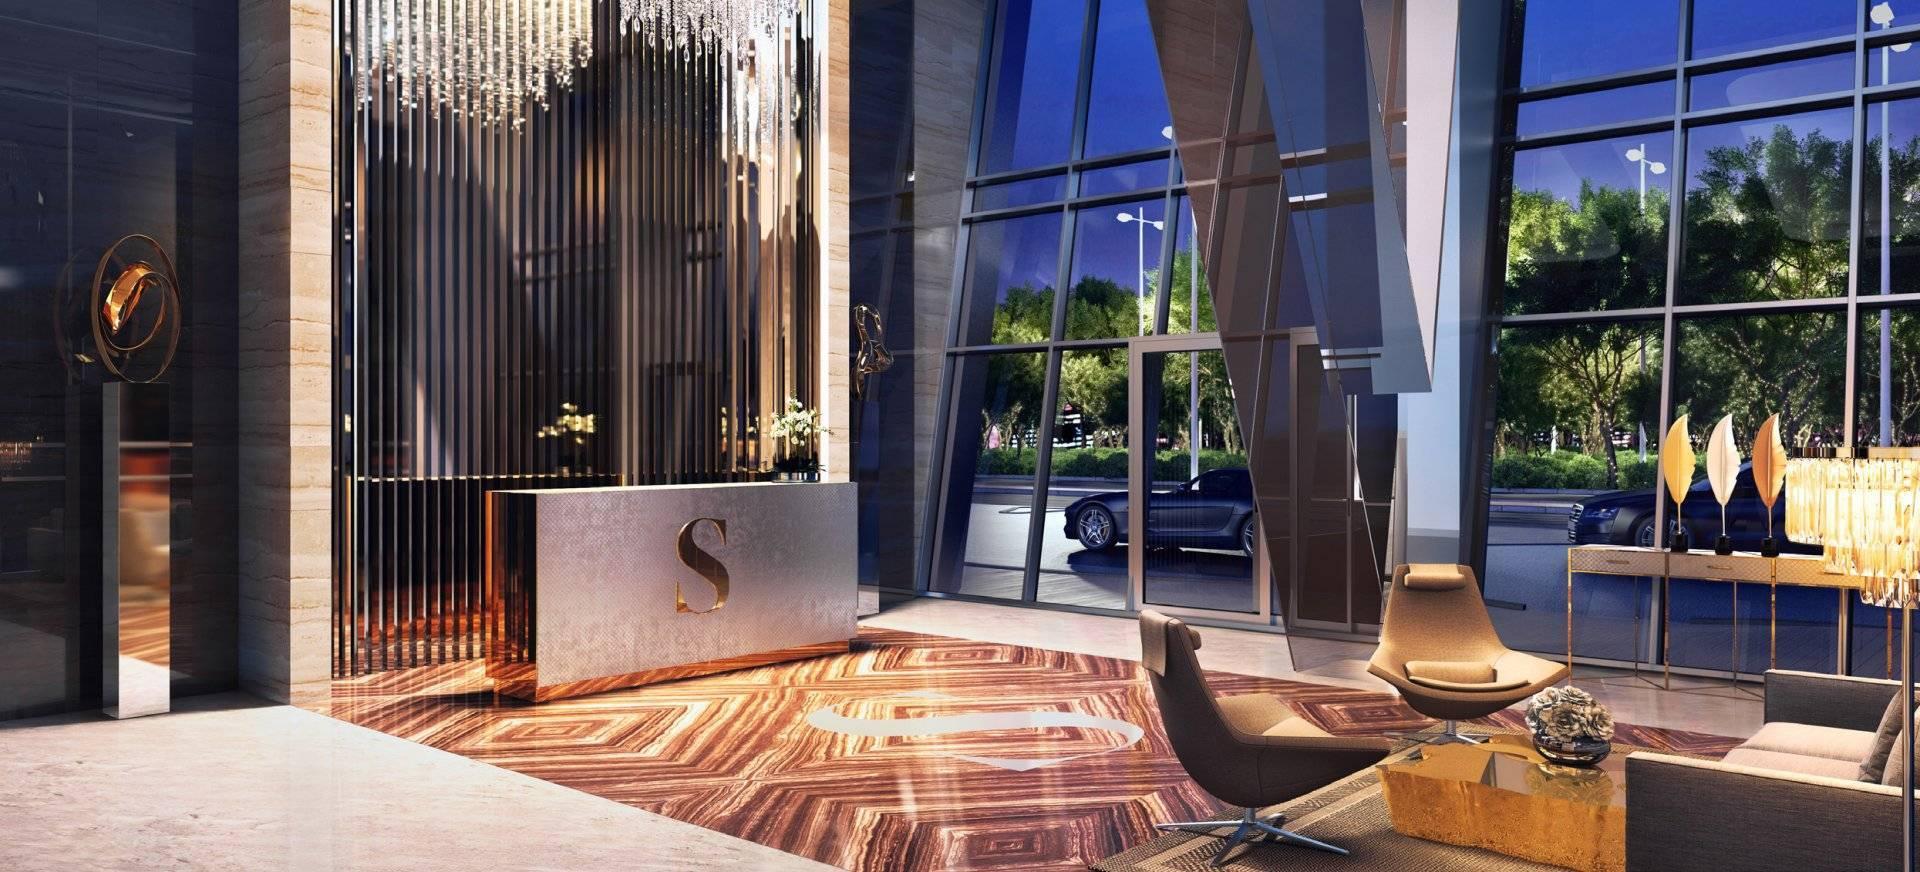 1 6 Downtown Dubai